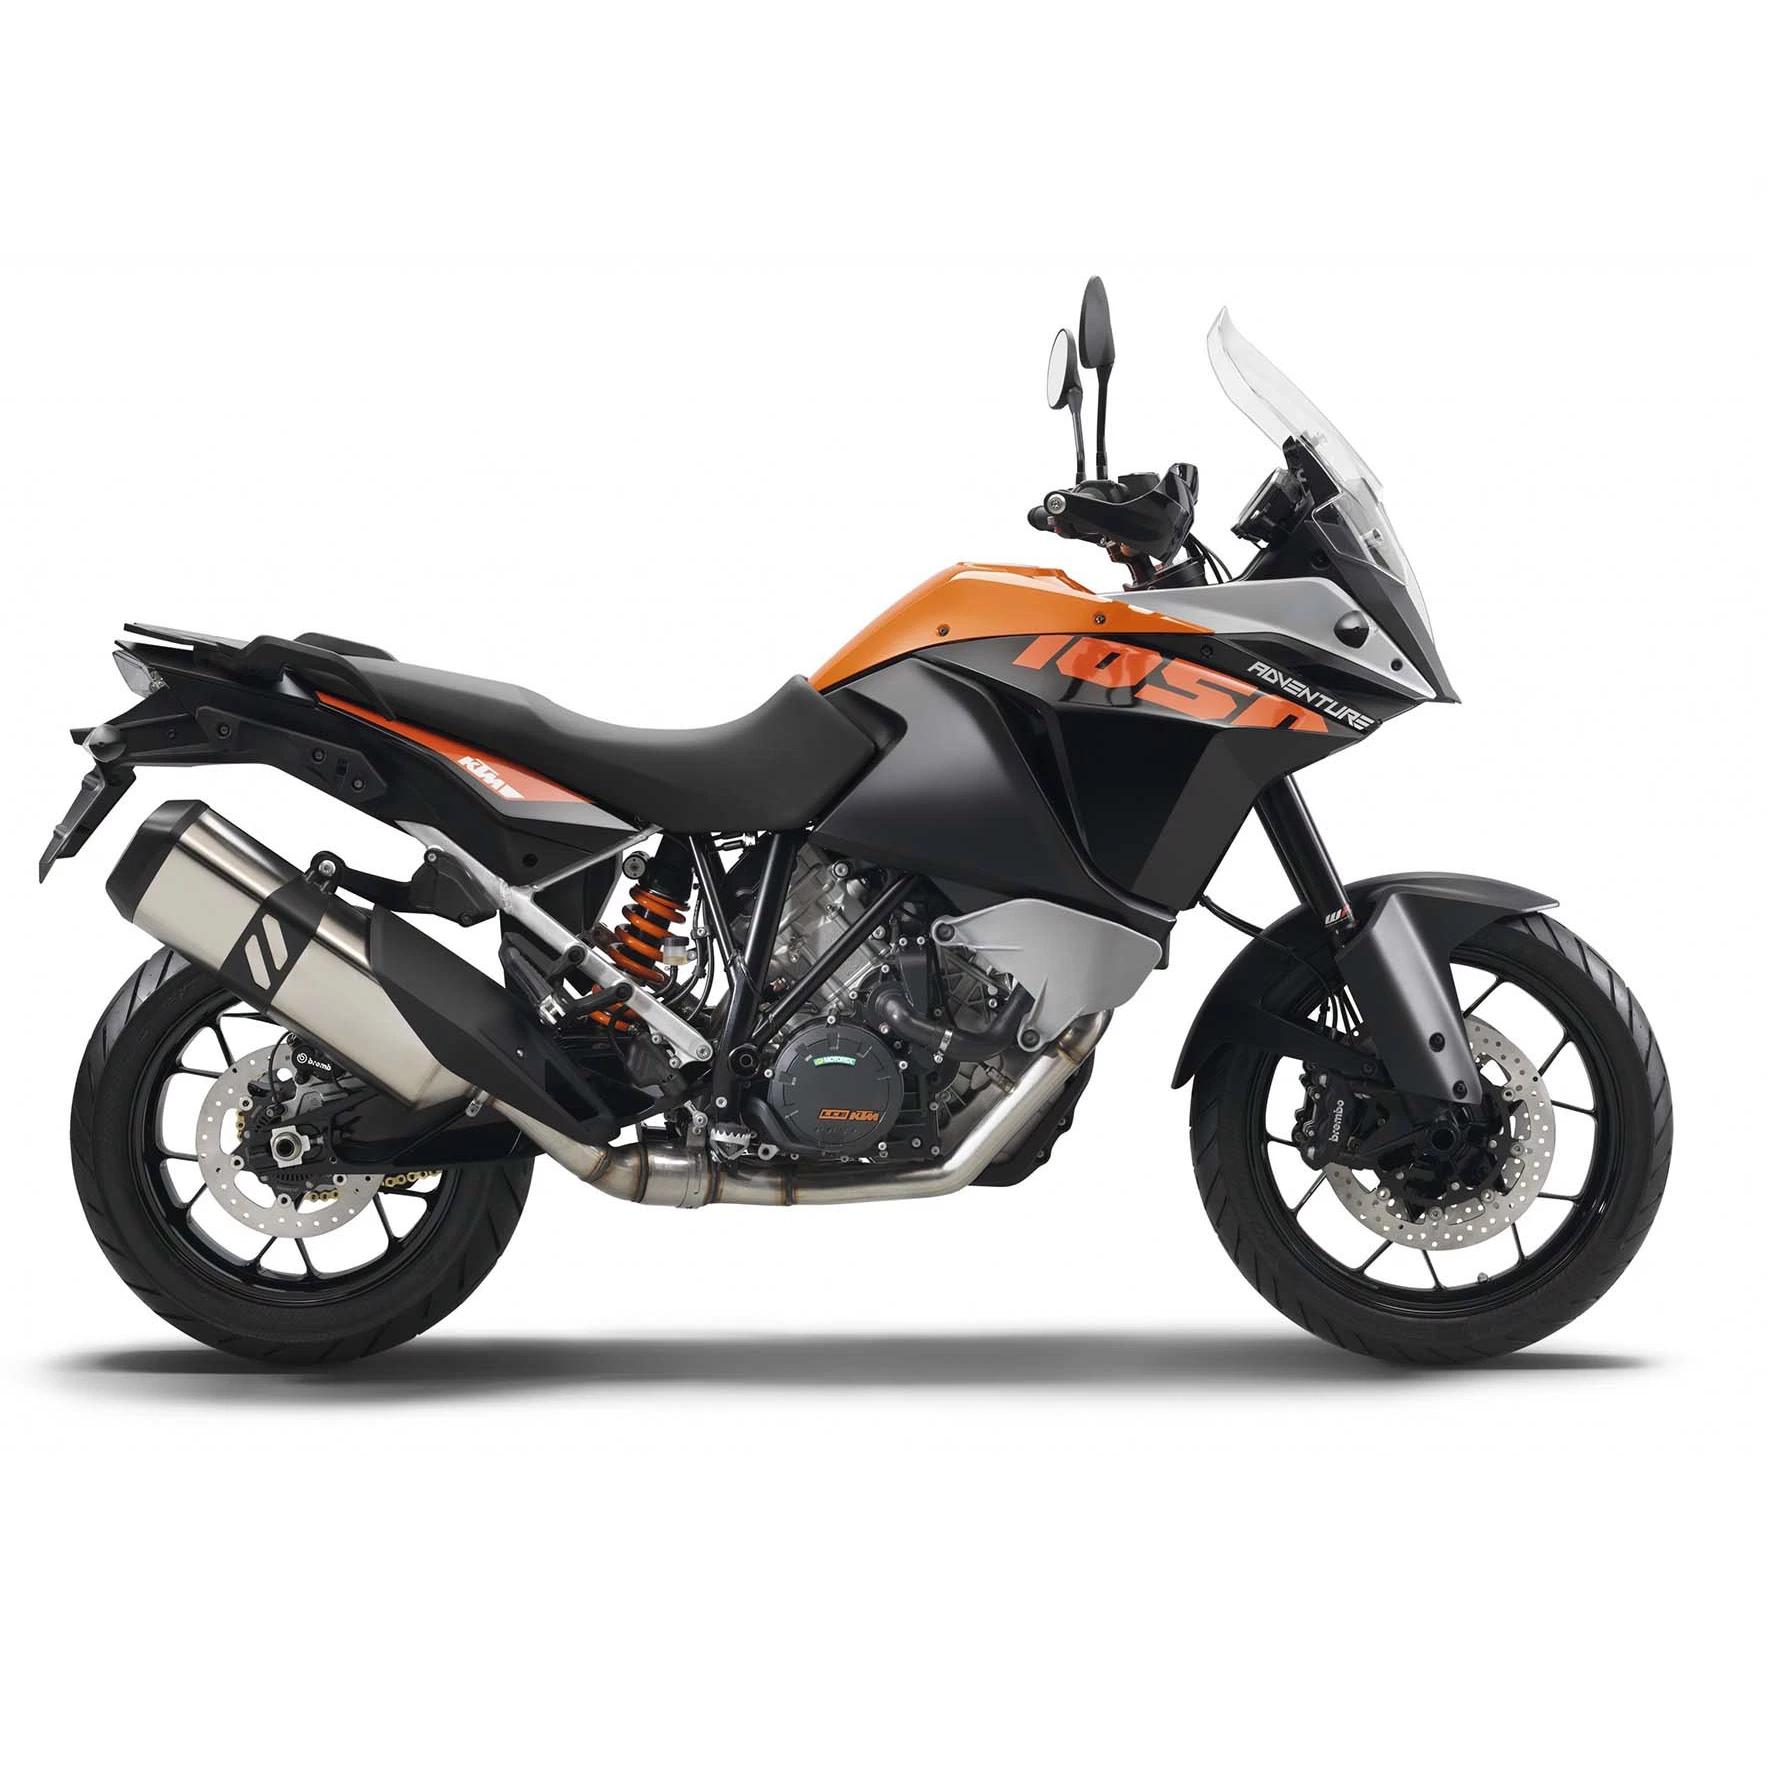 KTM Adventure 1050 / 1090 / 1190 / 1290